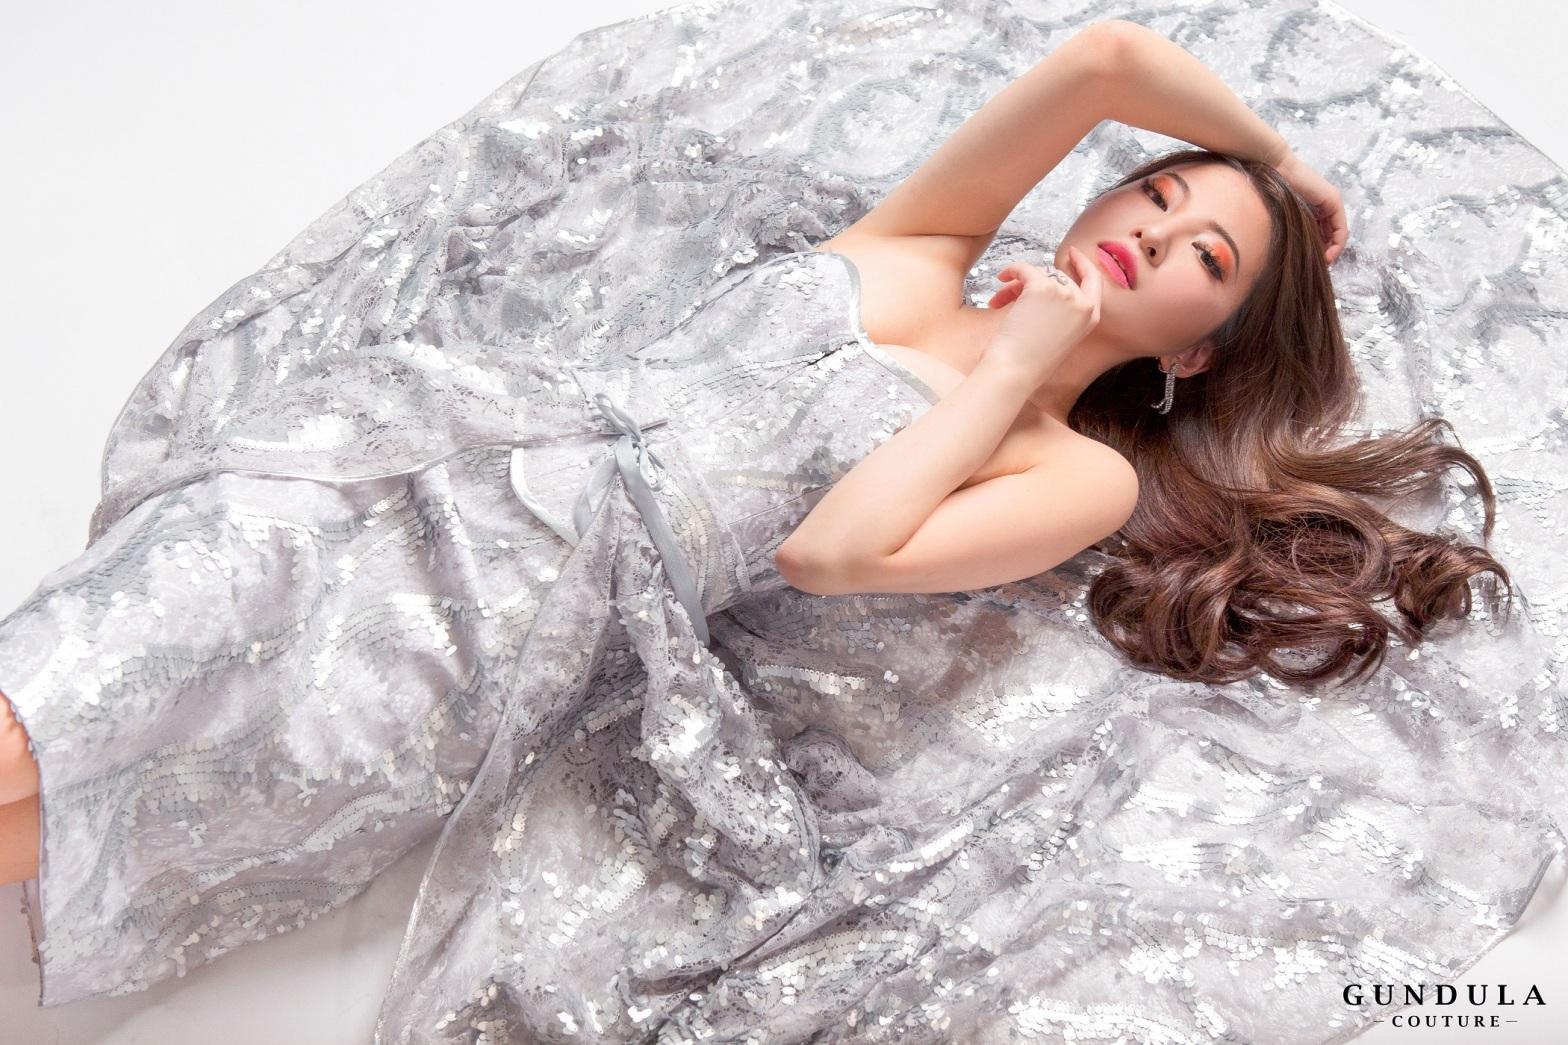 An image of a dress created by Gundula Hirn of Gundula Couture.